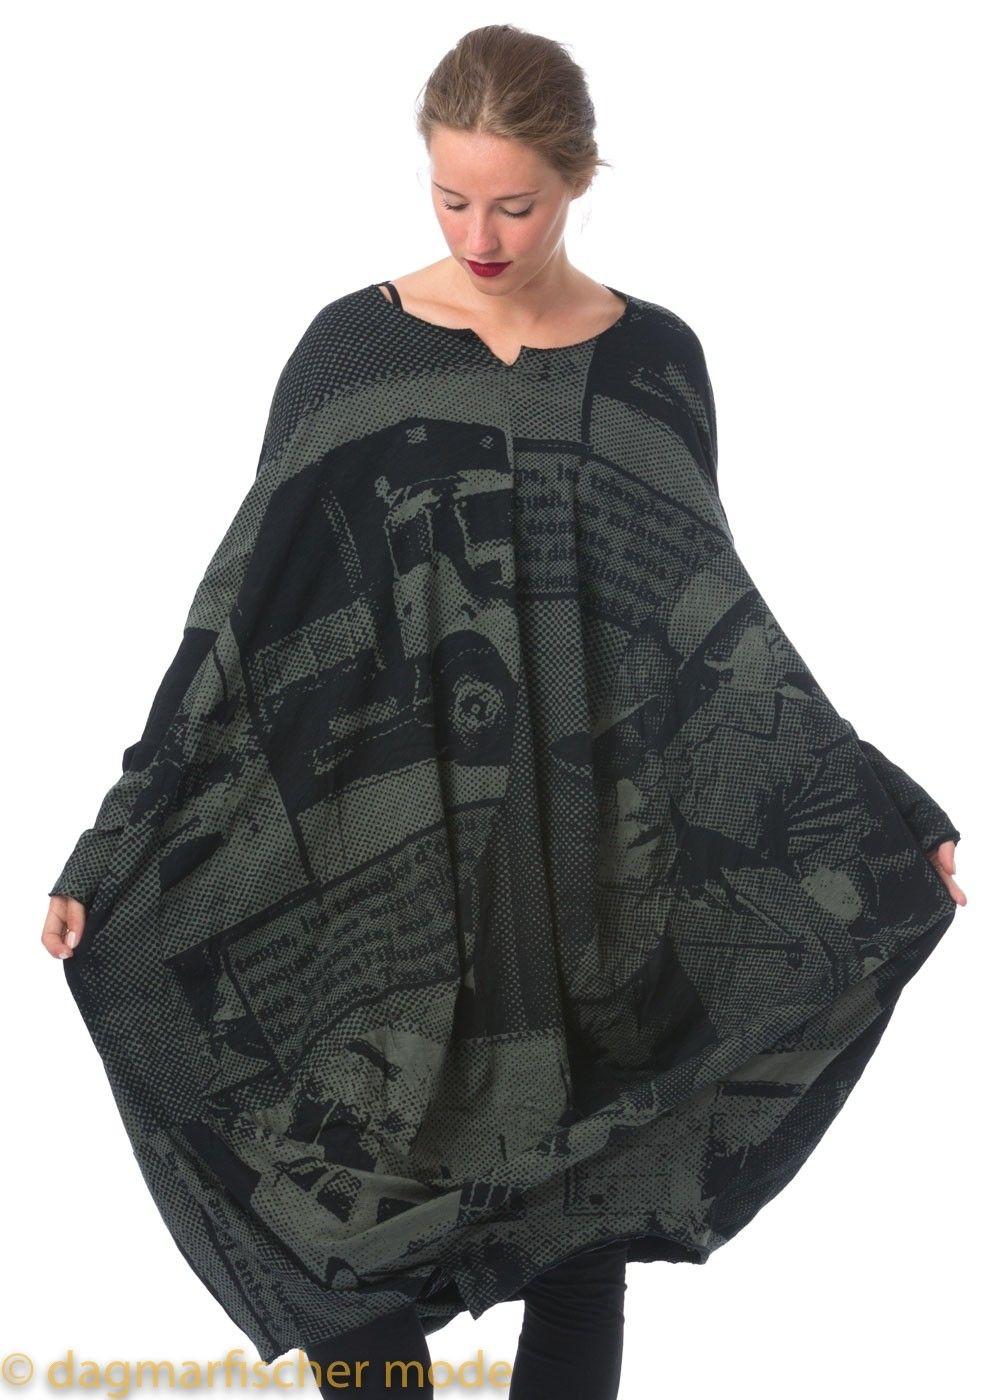 c5feb9d6f011ab Überdimensionales Kleid. Oversize dress by RUNDHOLZ BLACK LABEL in black or  different colors - dagmarfischermode.de